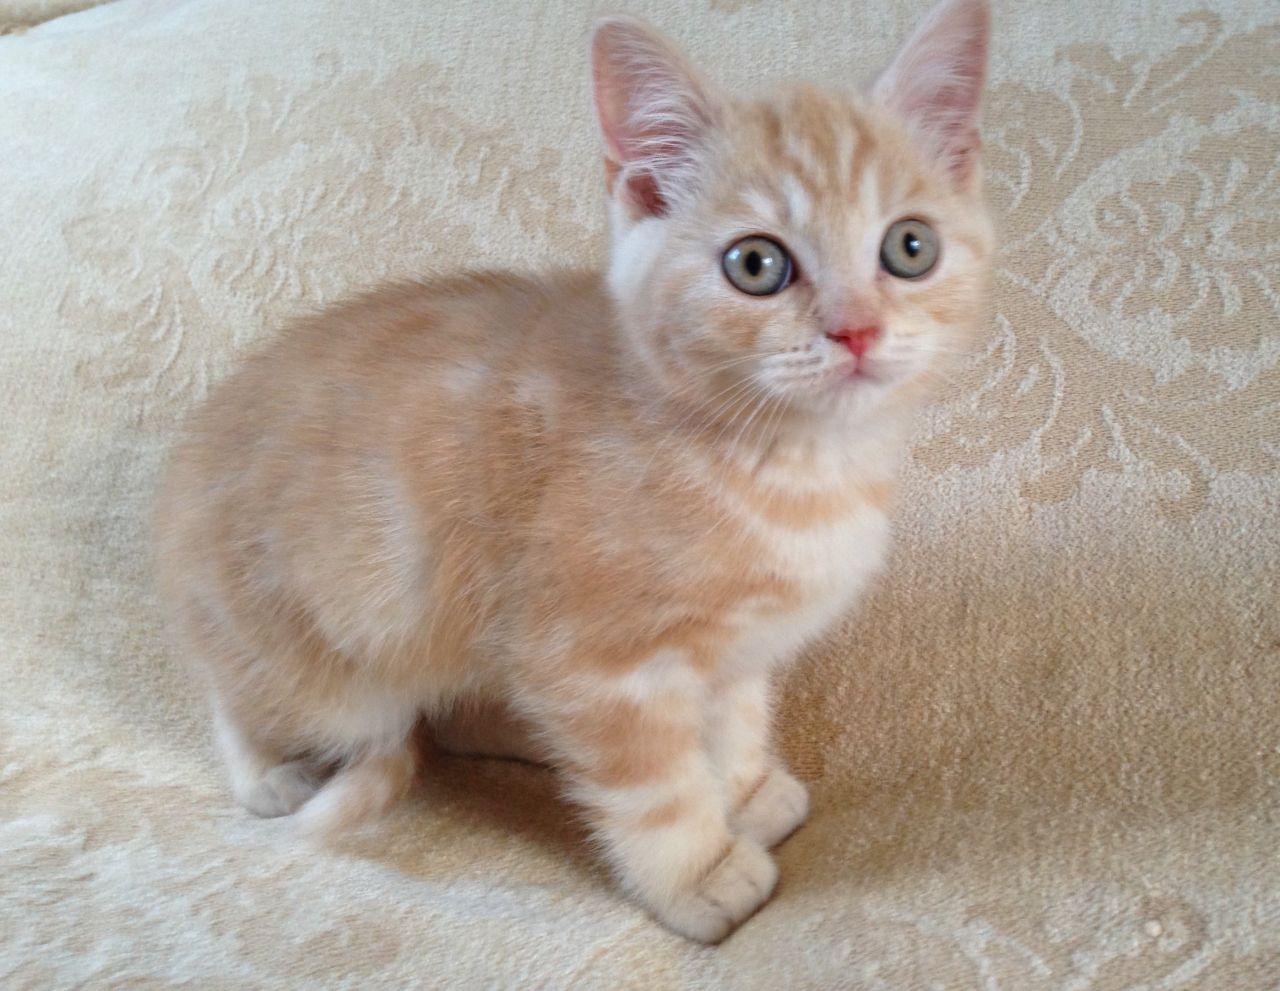 cats scottish fold for sale  scottish fold breeders hong kong  buy scottish fold breeders